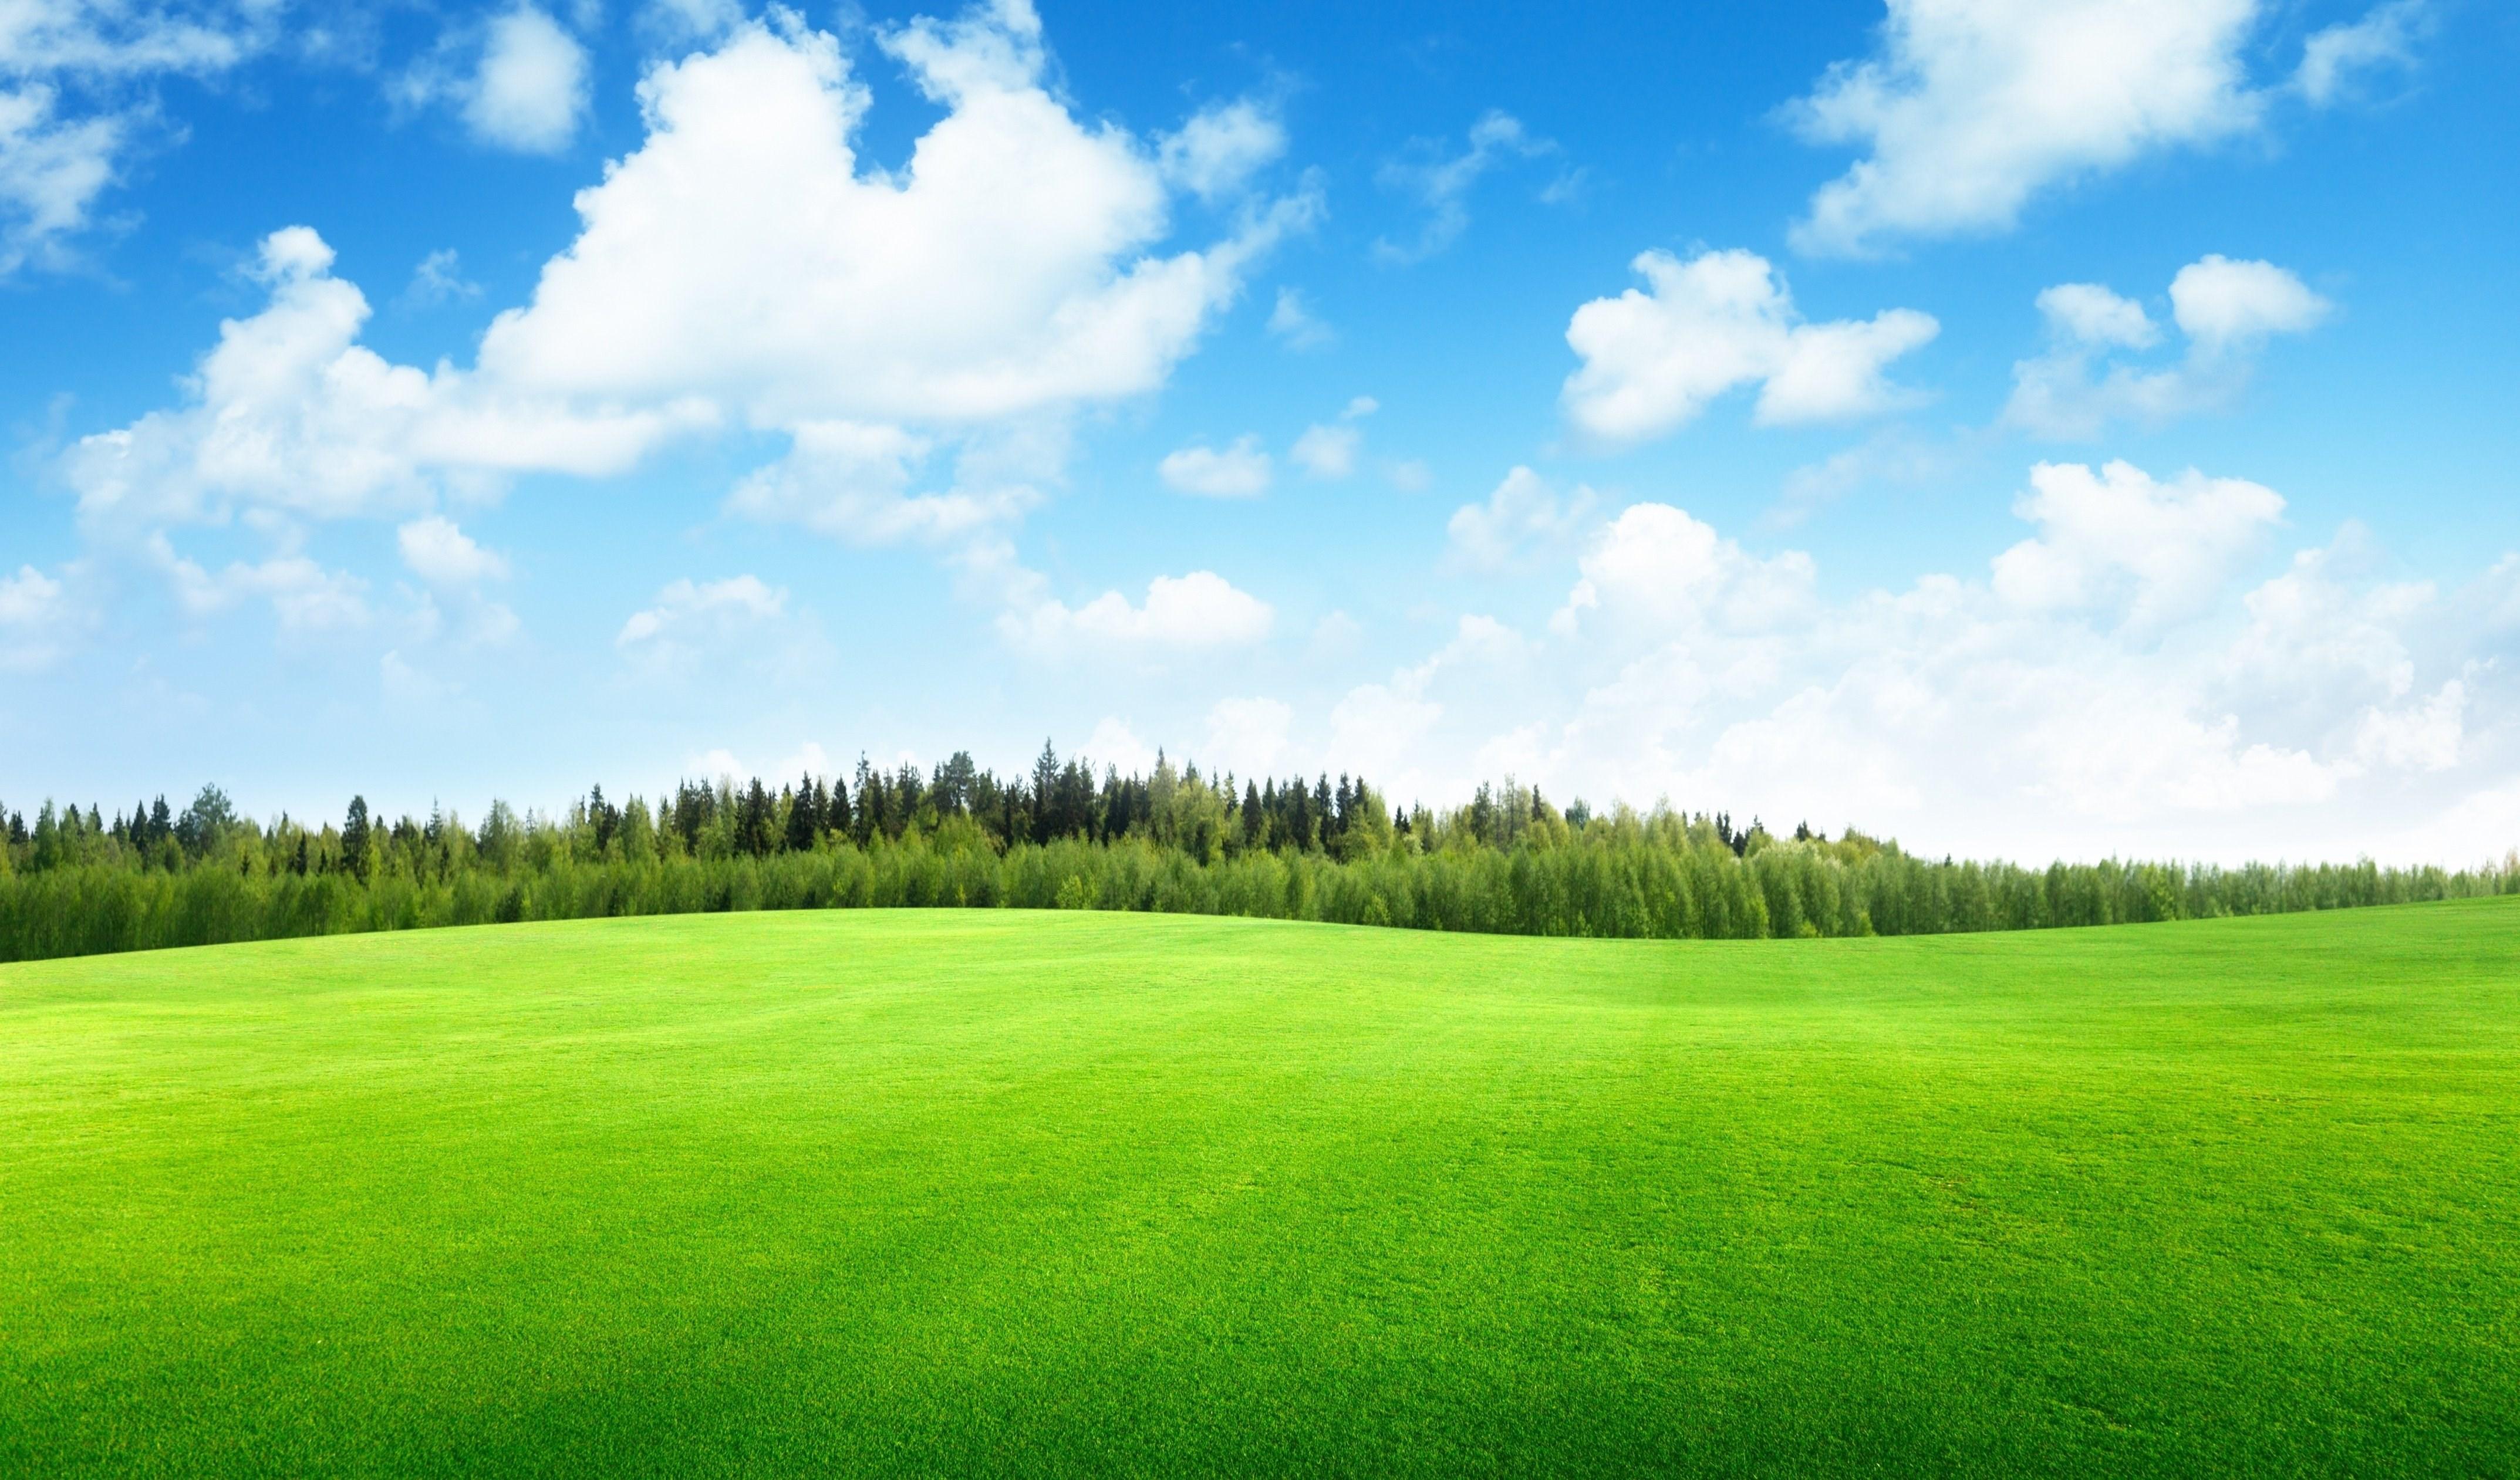 природа небо облака деревья поле nature the sky clouds trees field  № 243732 без смс